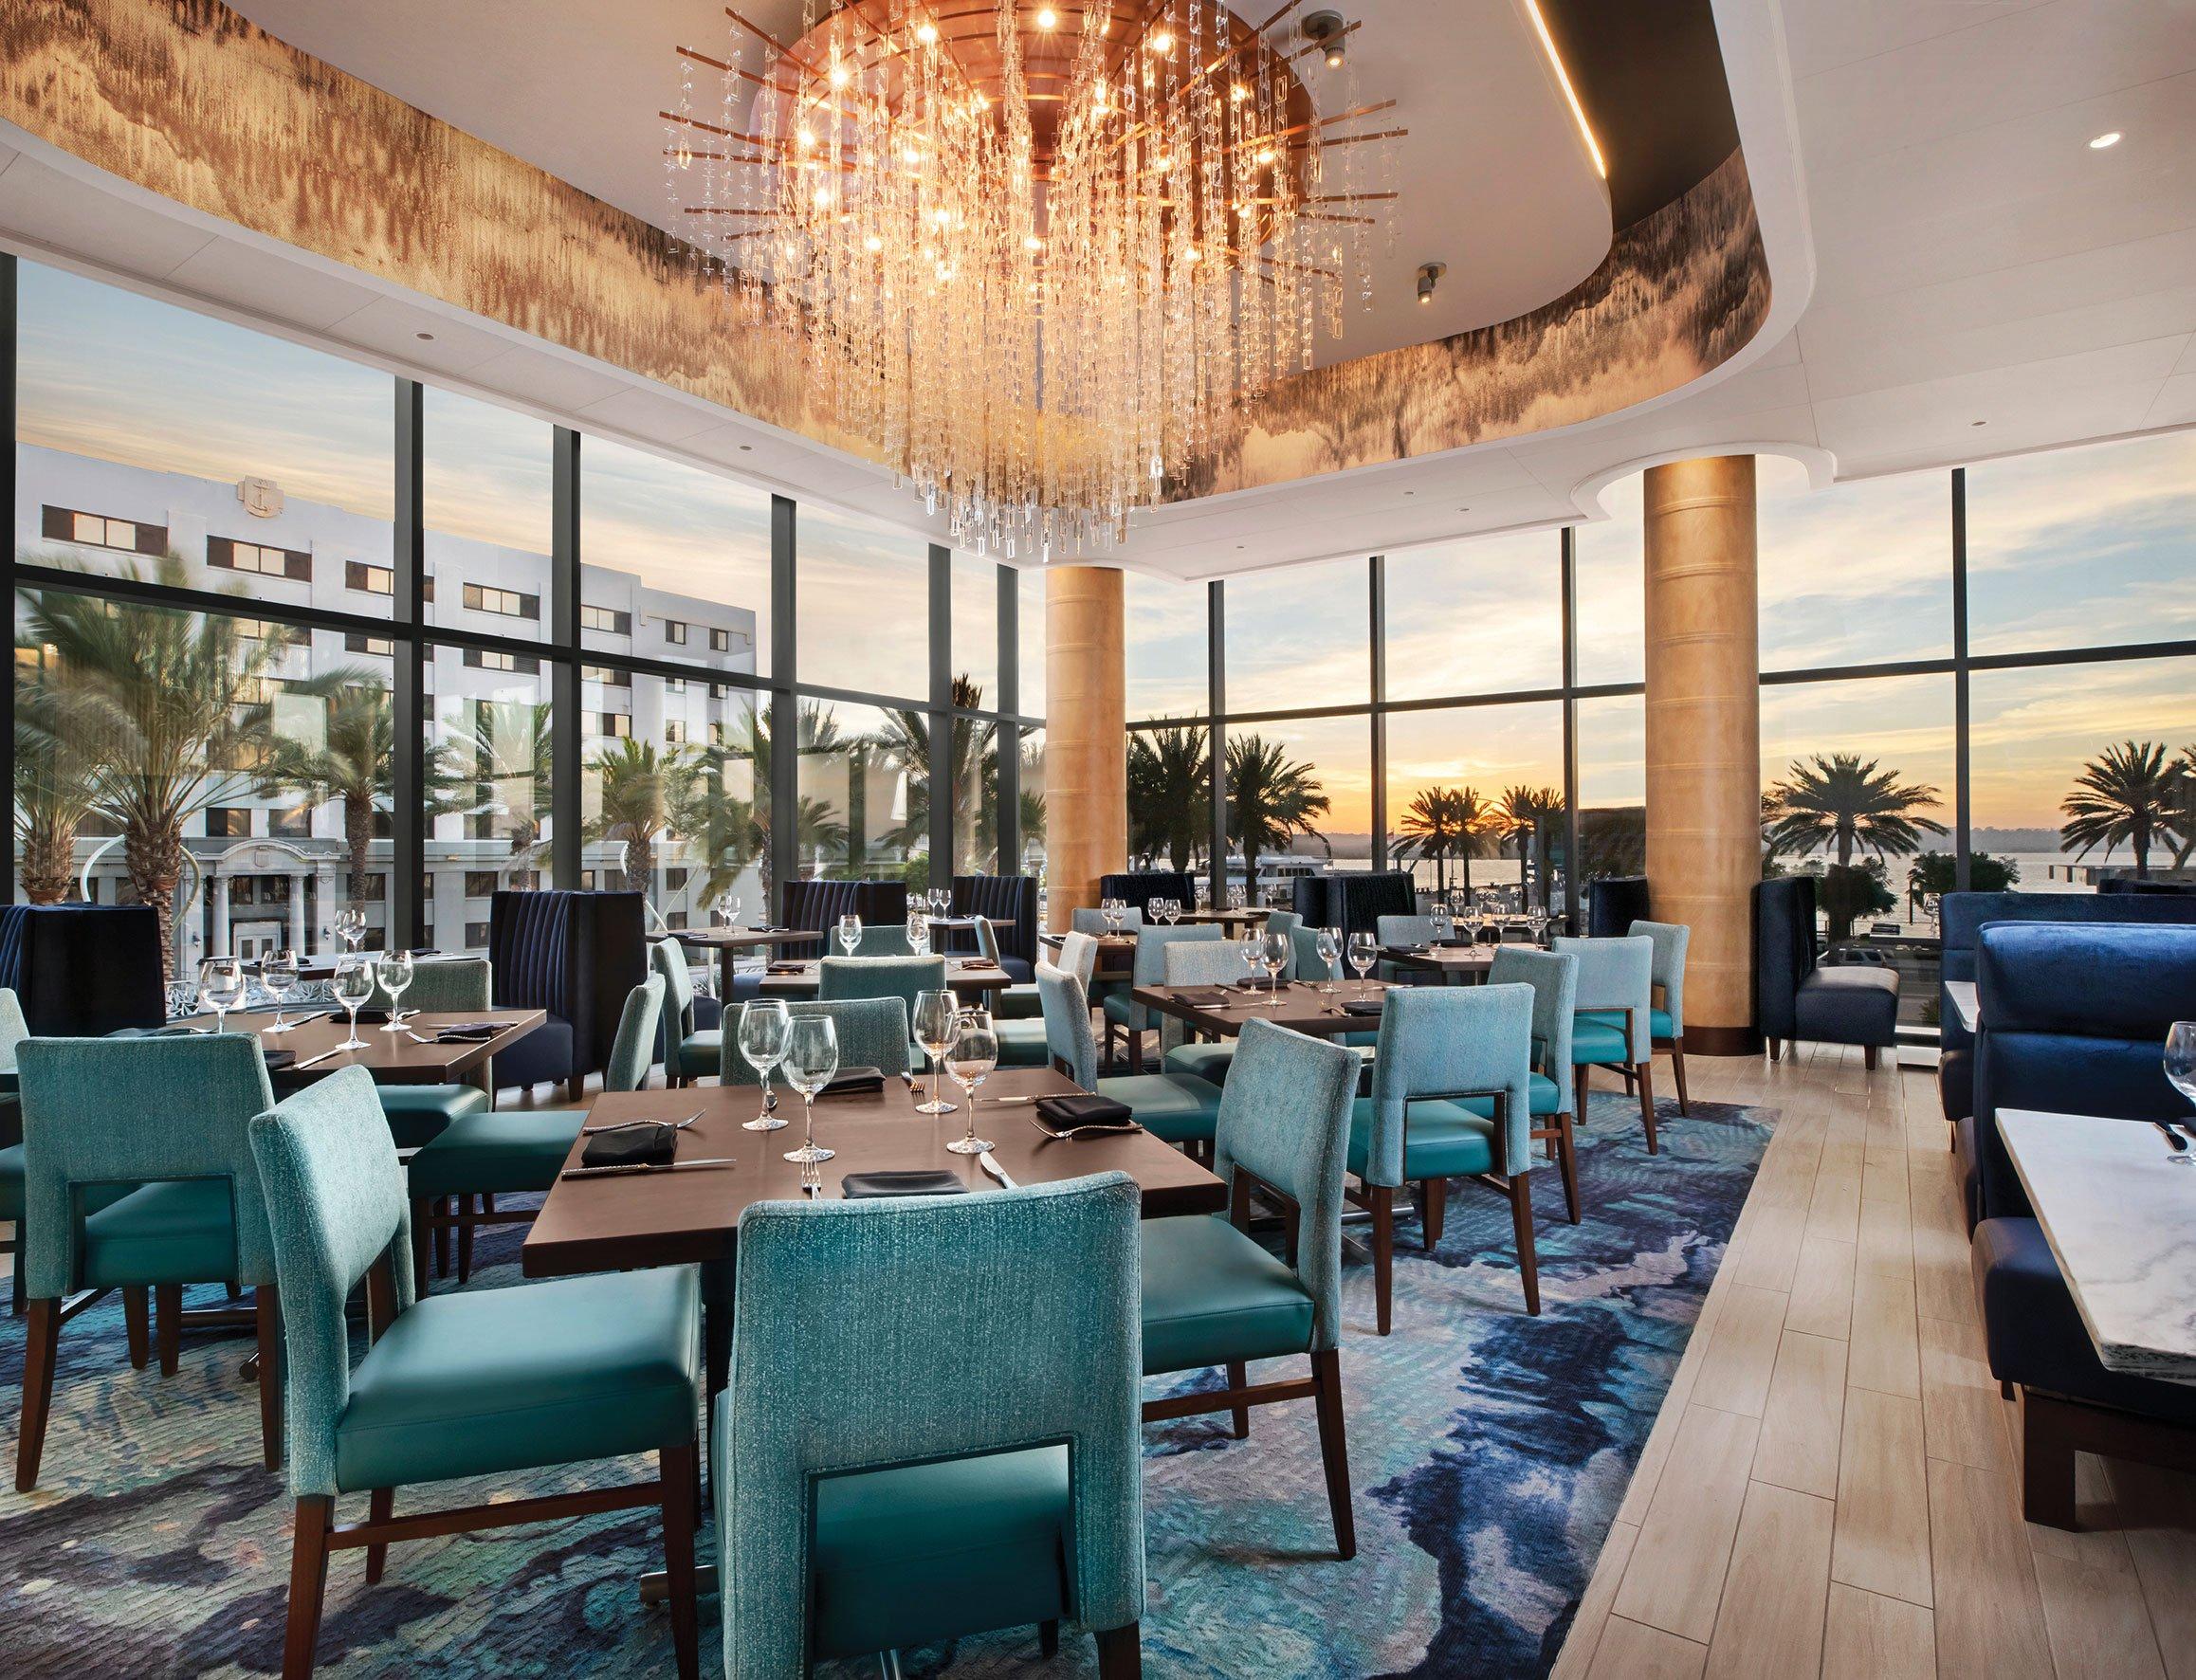 Del Frisco's Double Eagle Steakhouse San Diego